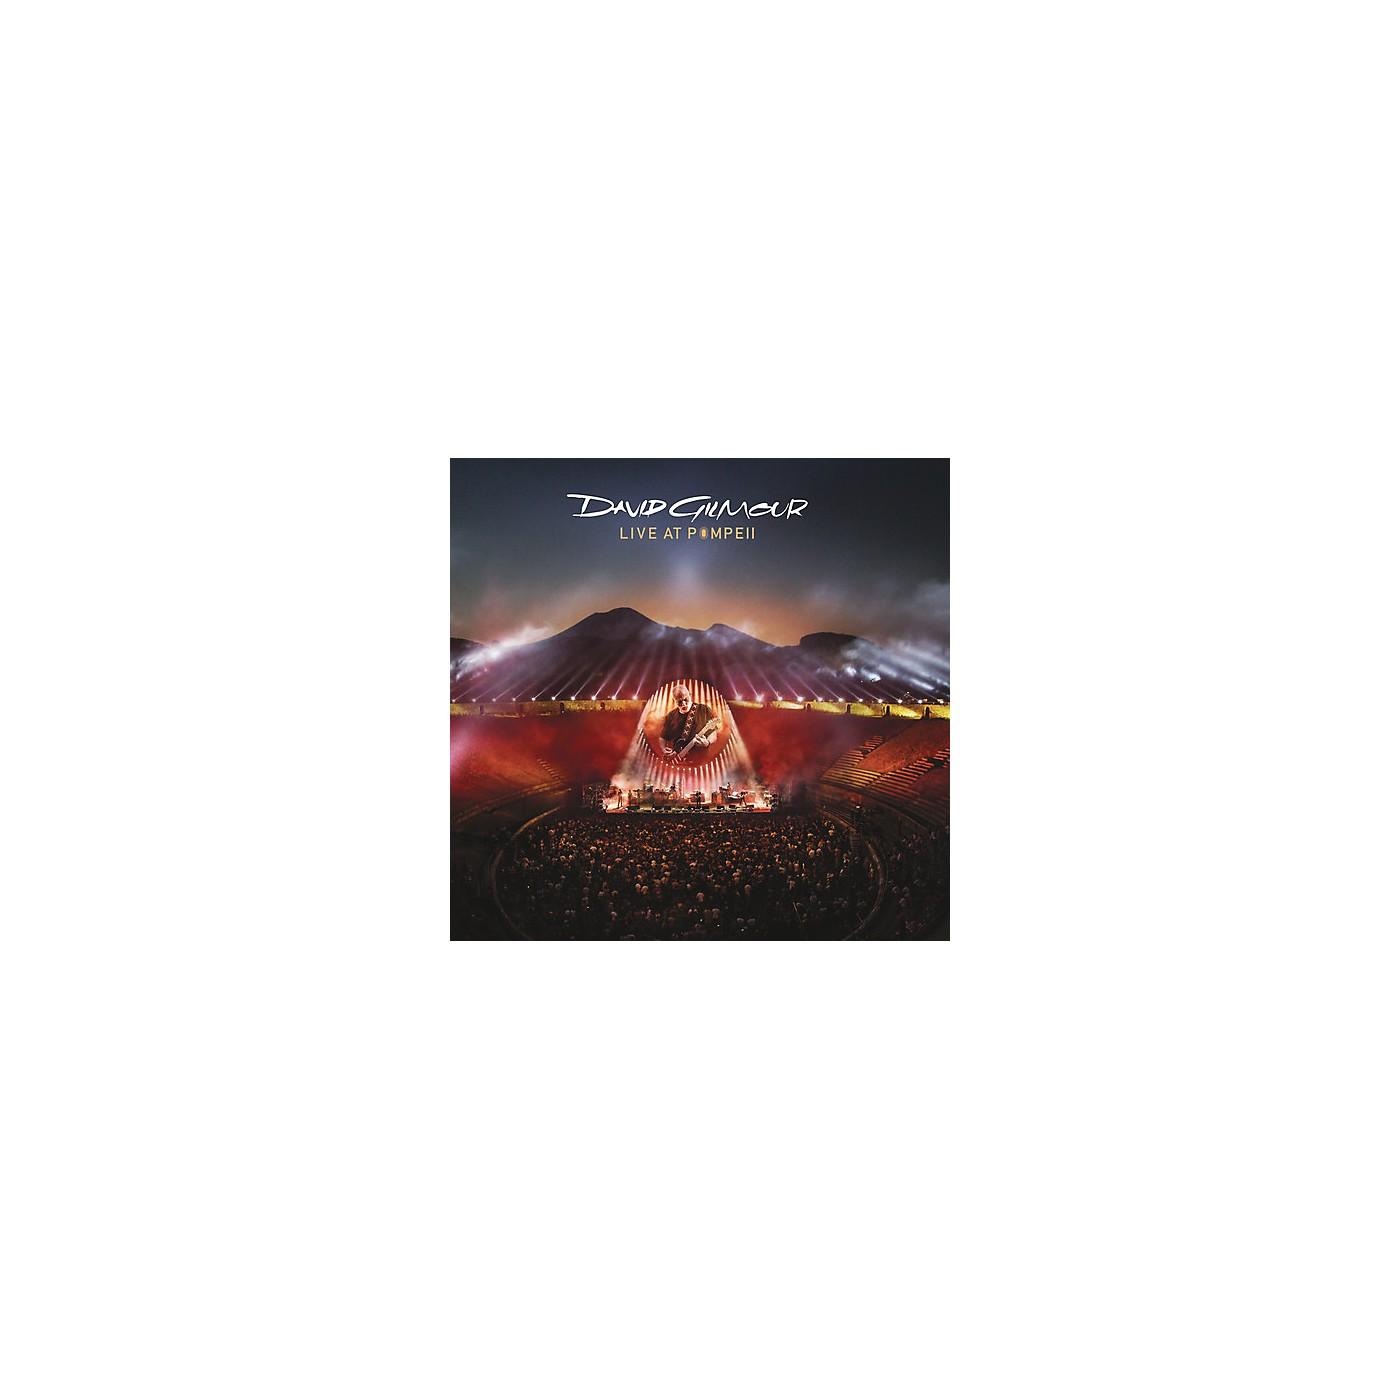 Sony David Gilmour - Live At Pompeii thumbnail